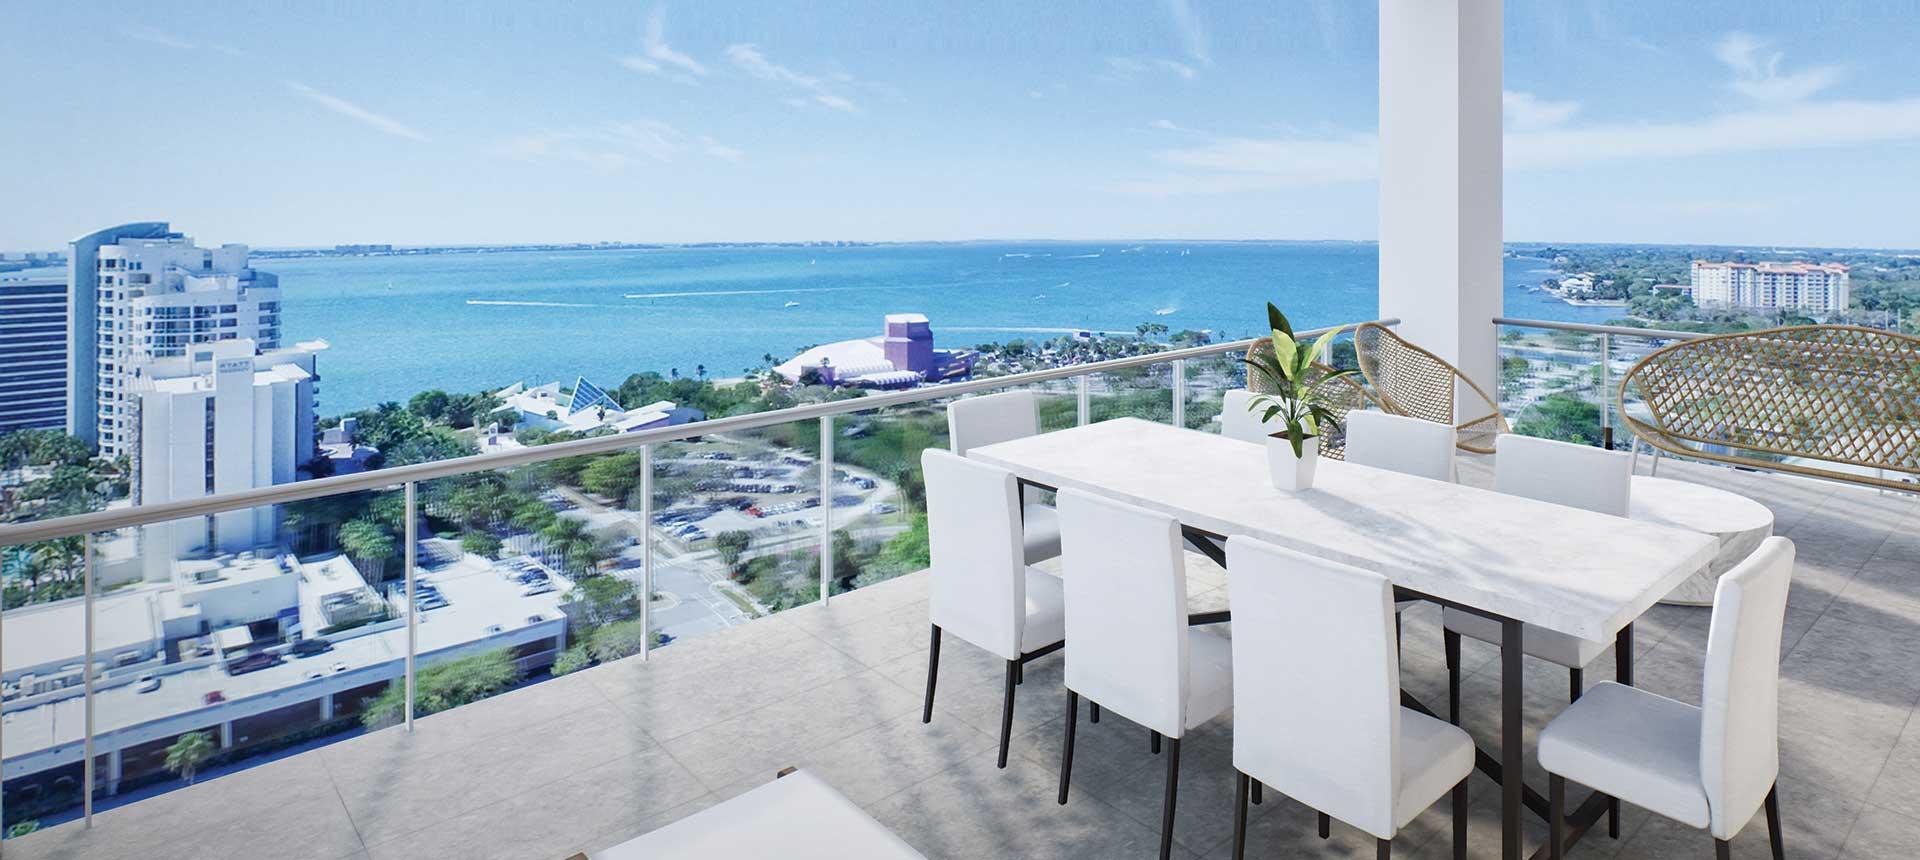 Ocean view from Blvd Sarasota